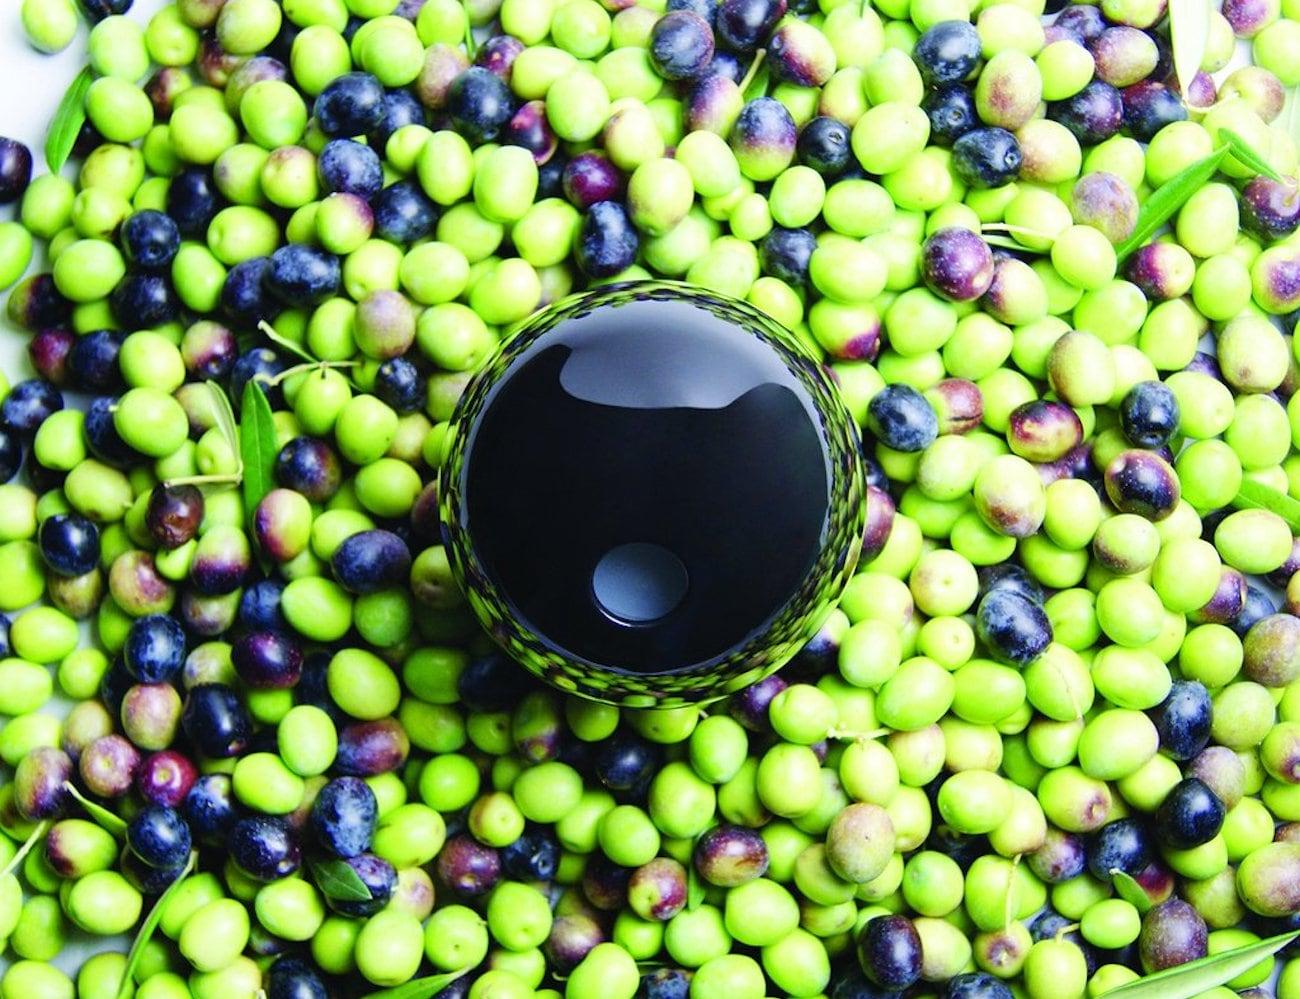 MPFX Oli Porcelain Olive Bowl